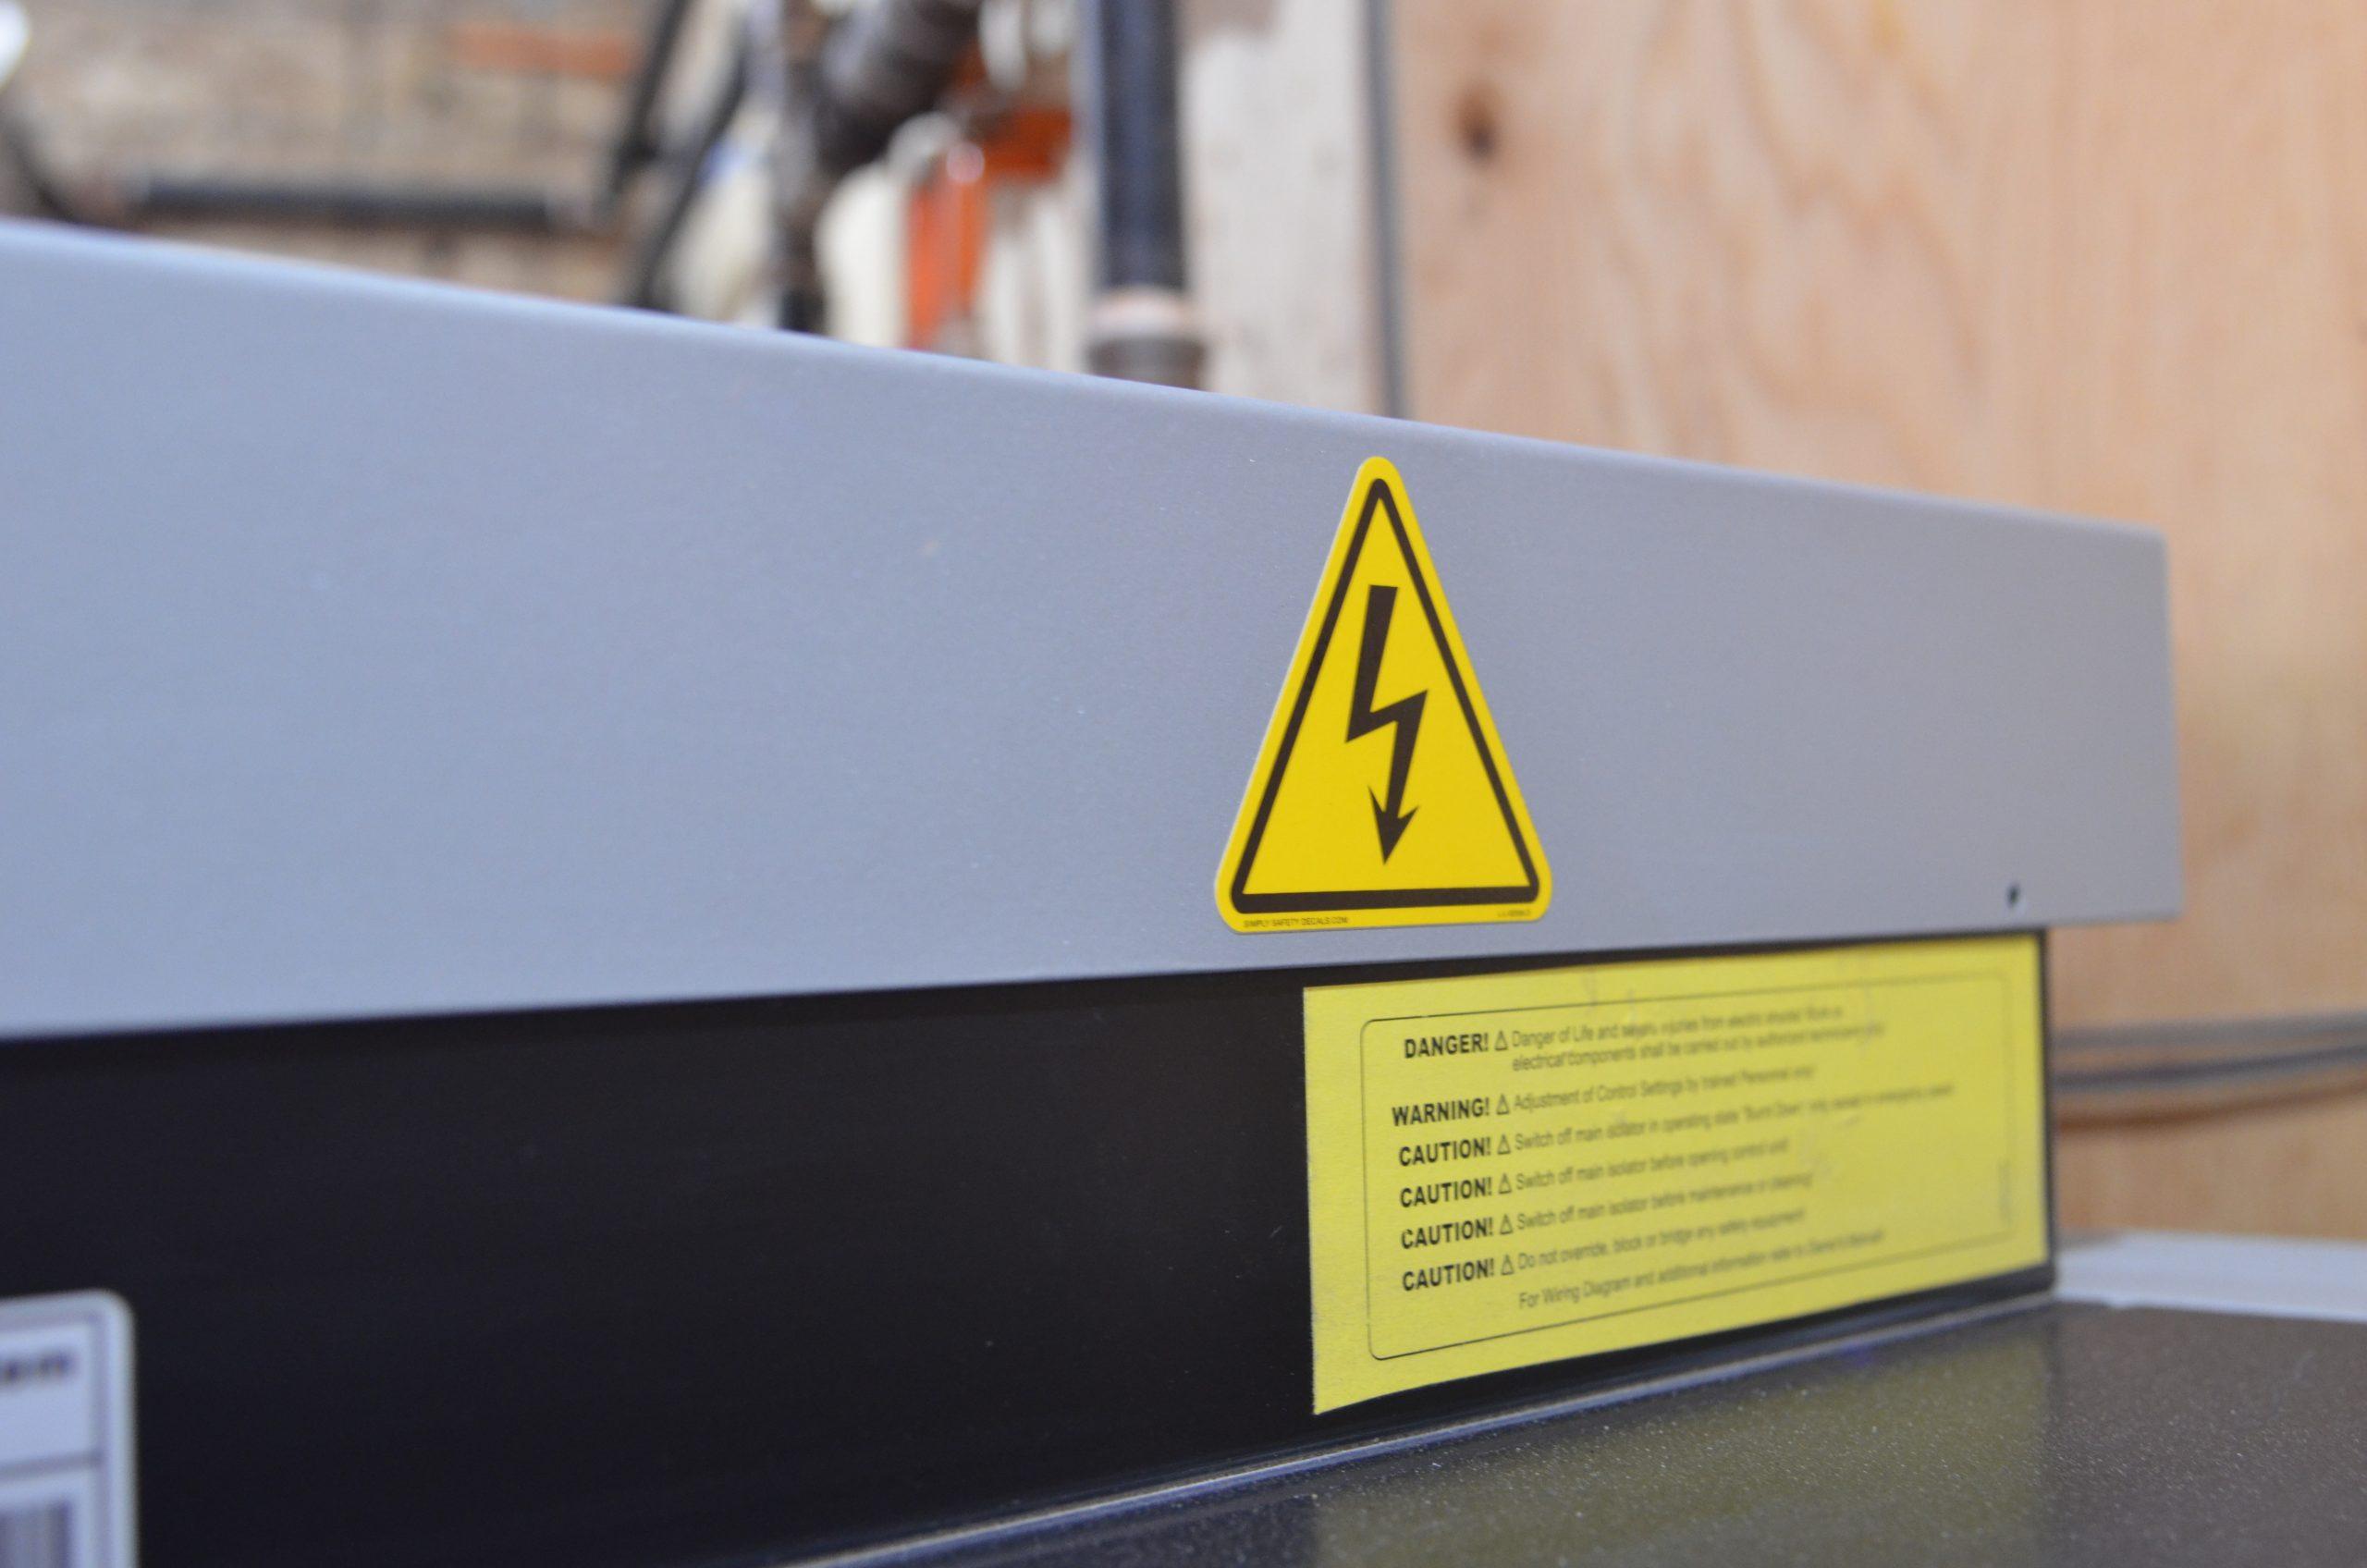 Dangerous Voltage | ANSI